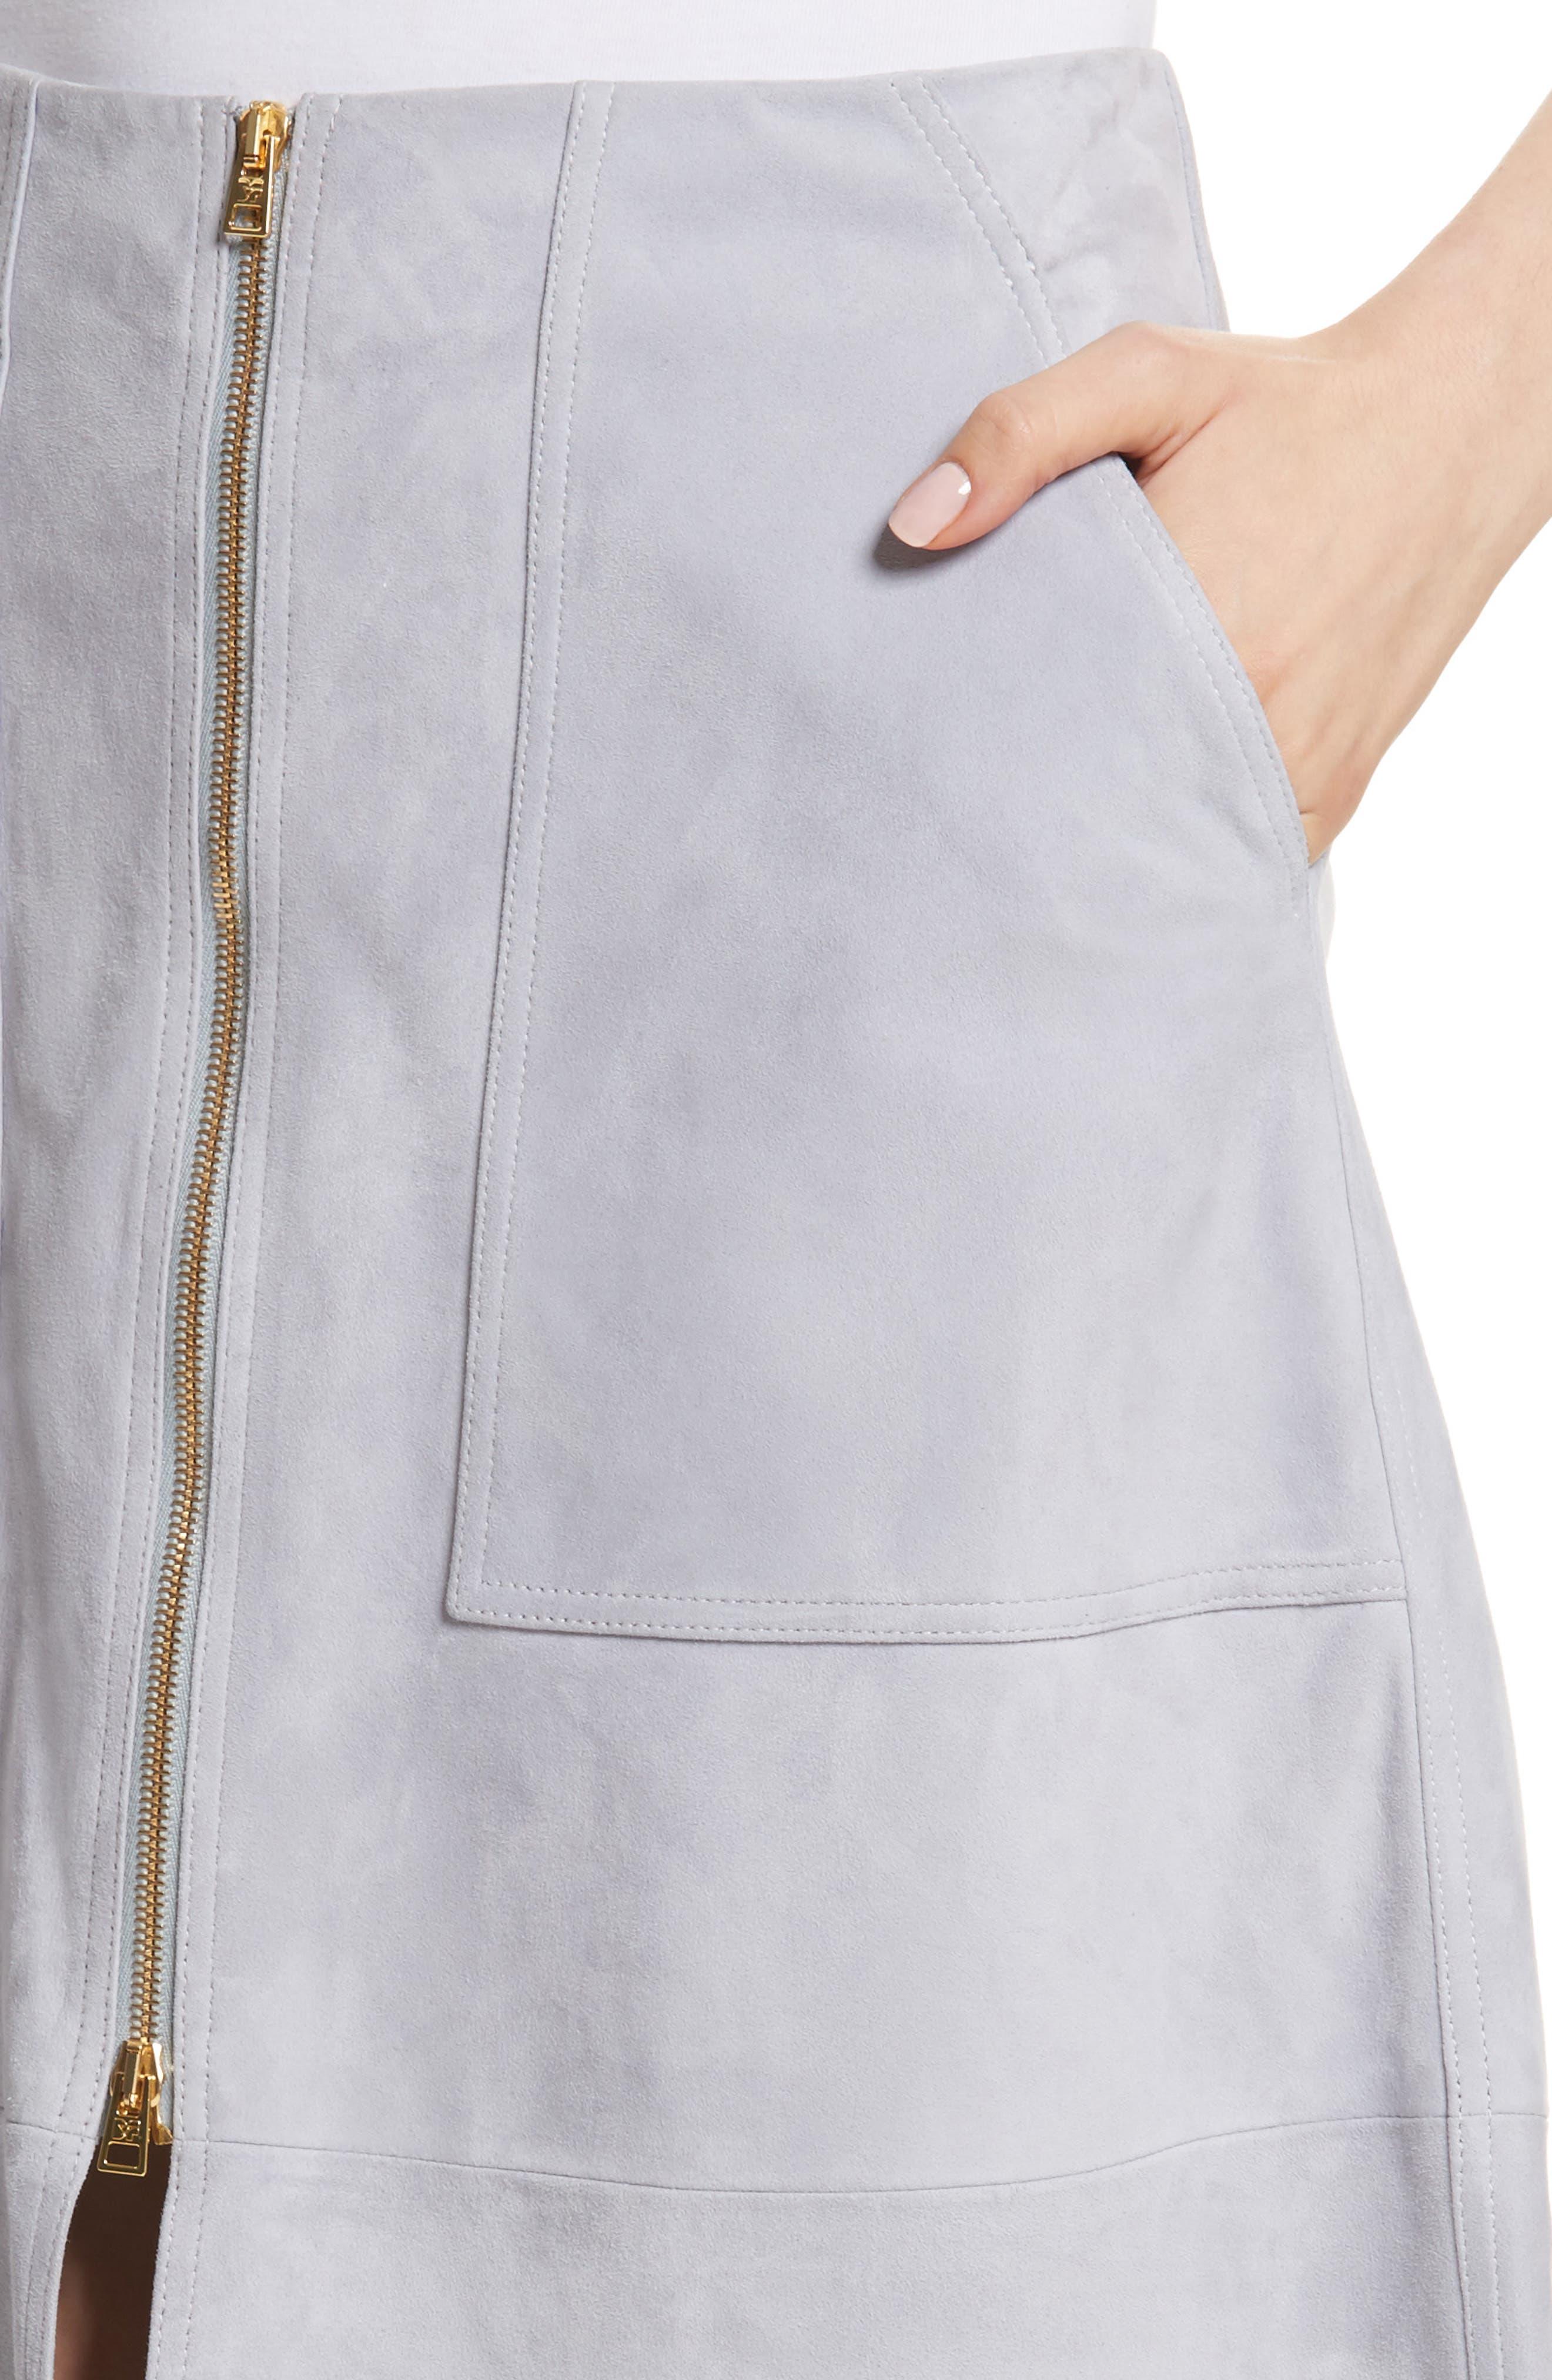 Diane von Furstenberg Patch Pocket Suede Midi Skirt,                             Alternate thumbnail 4, color,                             Smoke